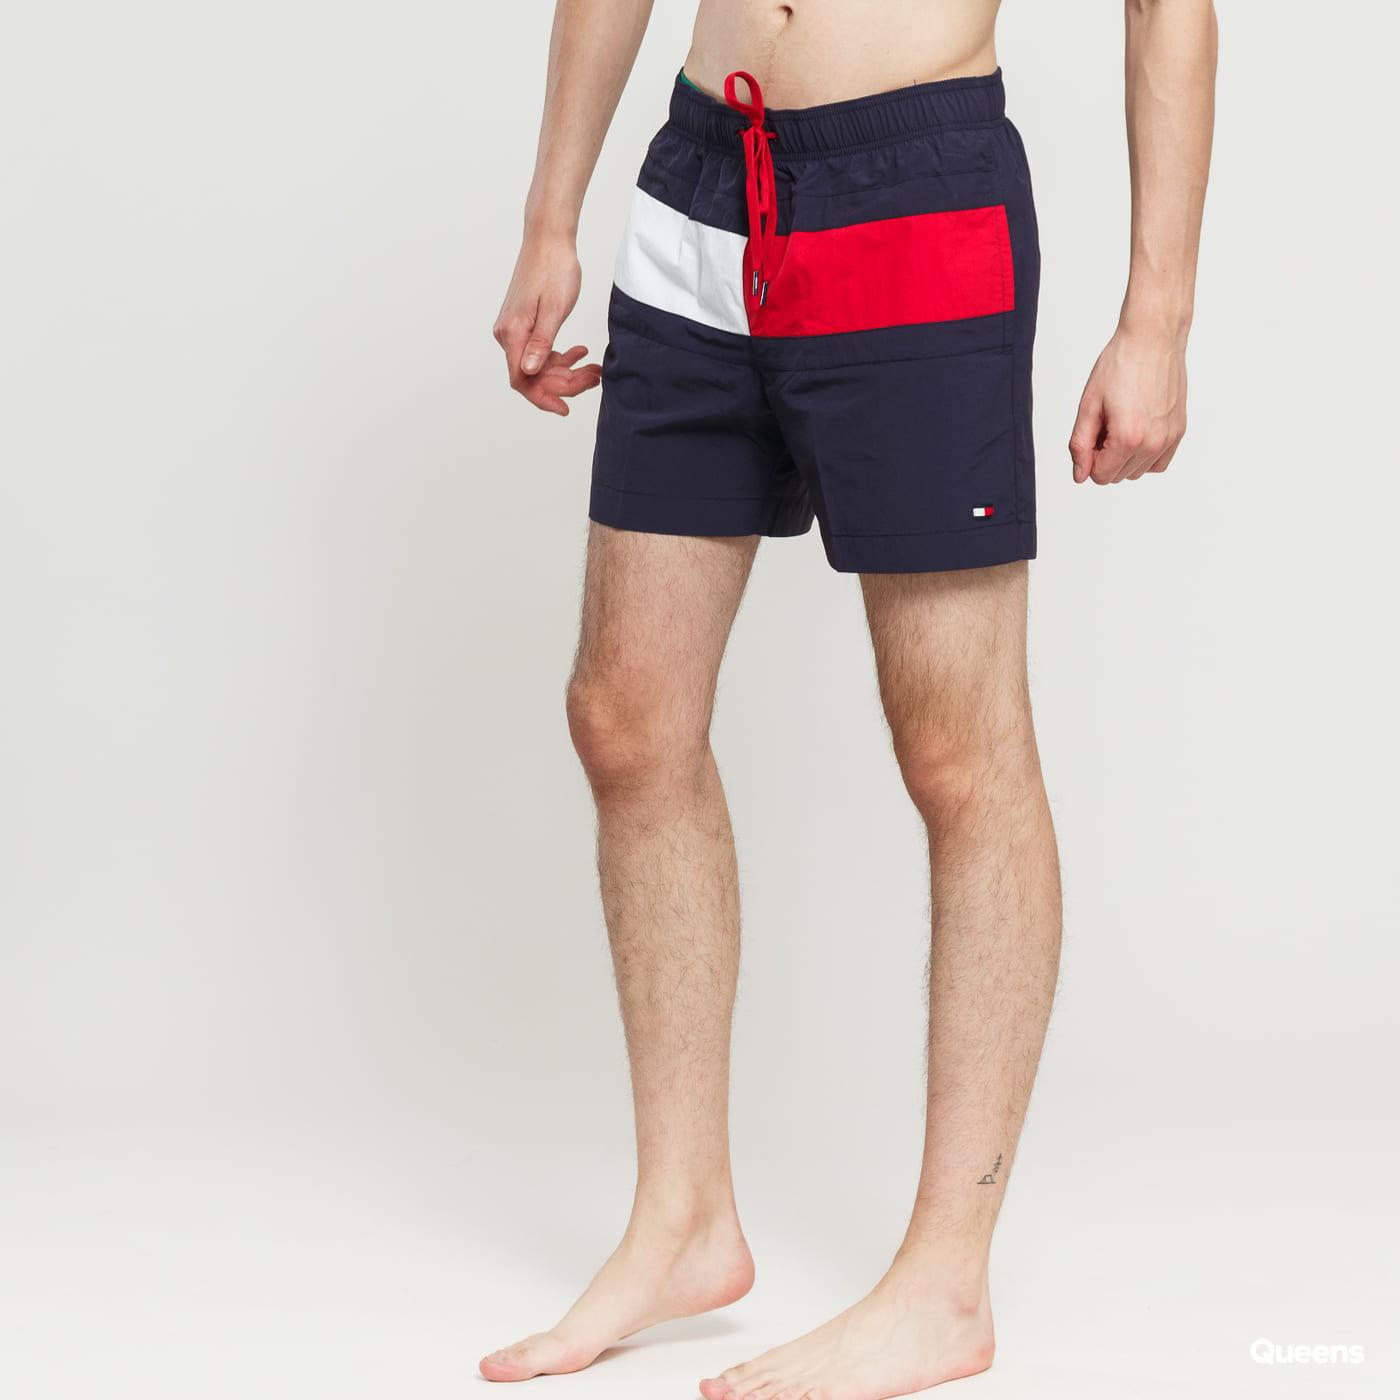 f3caa32576 Pánské koupací šortky Tommy Hilfiger Medium Drawstring (UM0UM01070 416) –  Queens 💚